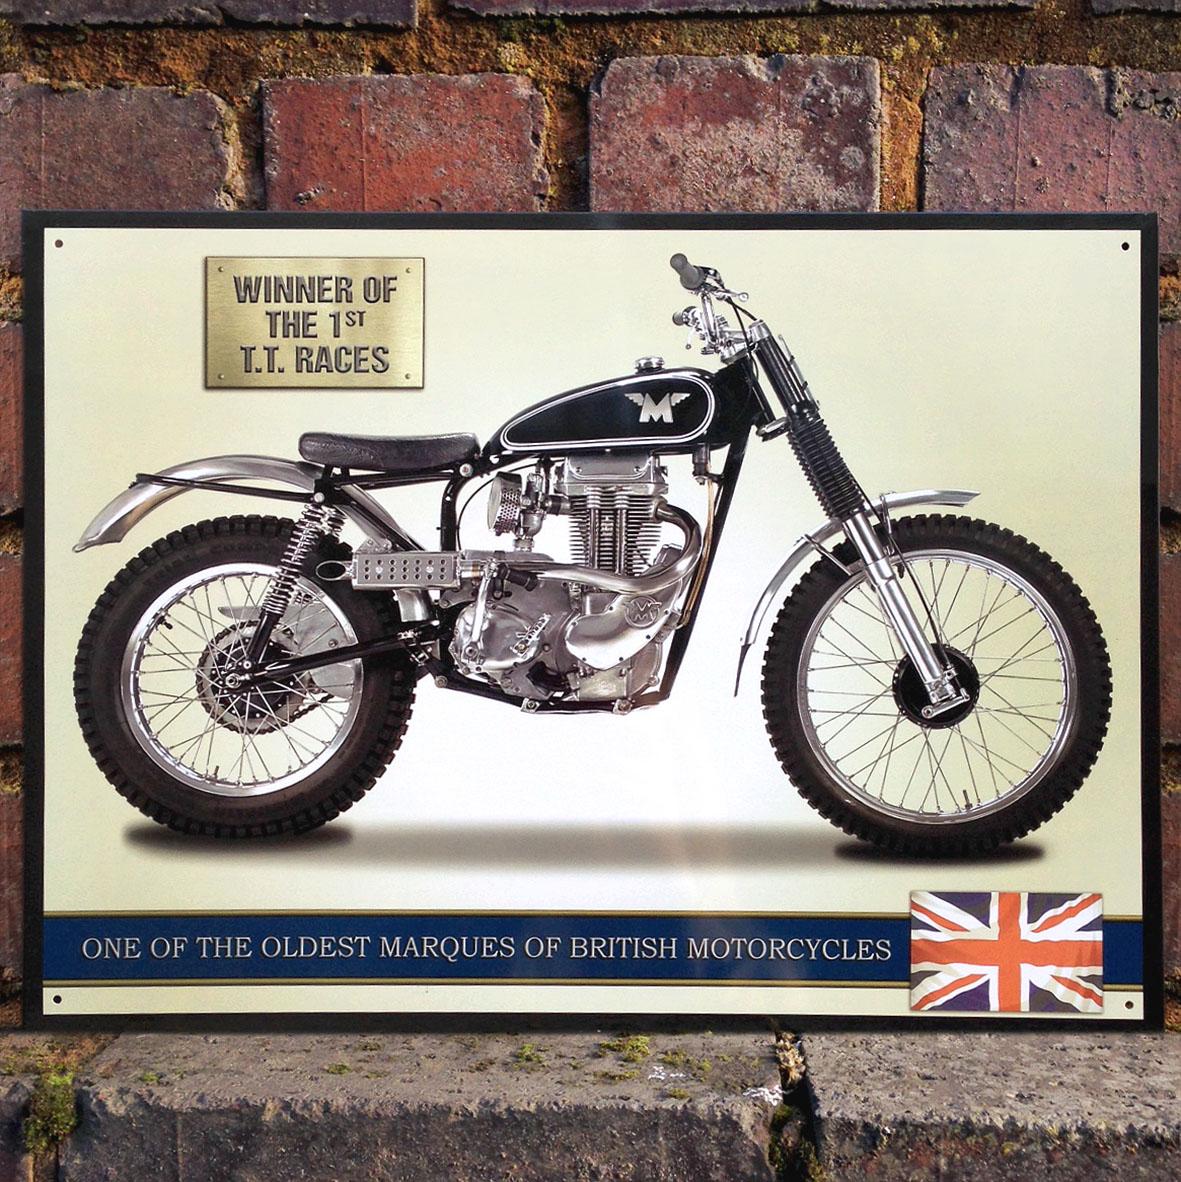 Matchless g3c motorcycle sign vintage metal plaque garage for Plaque garage w